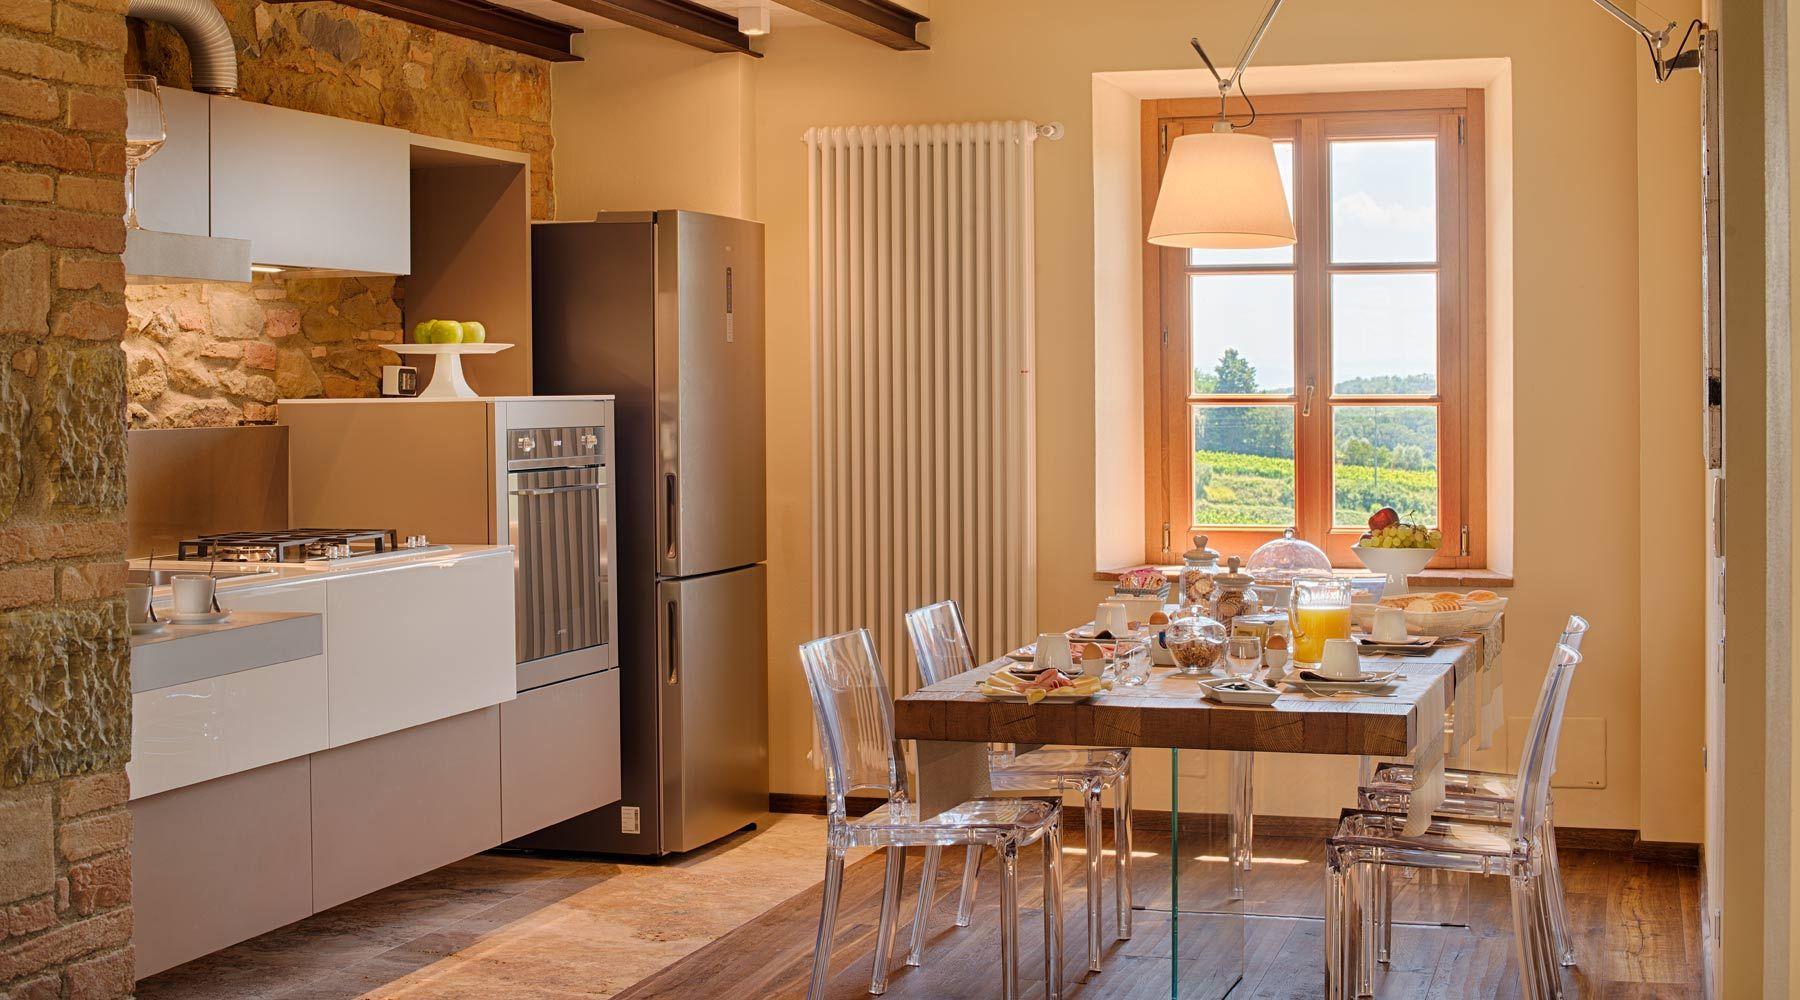 b&b di design toscano con cucina moderna